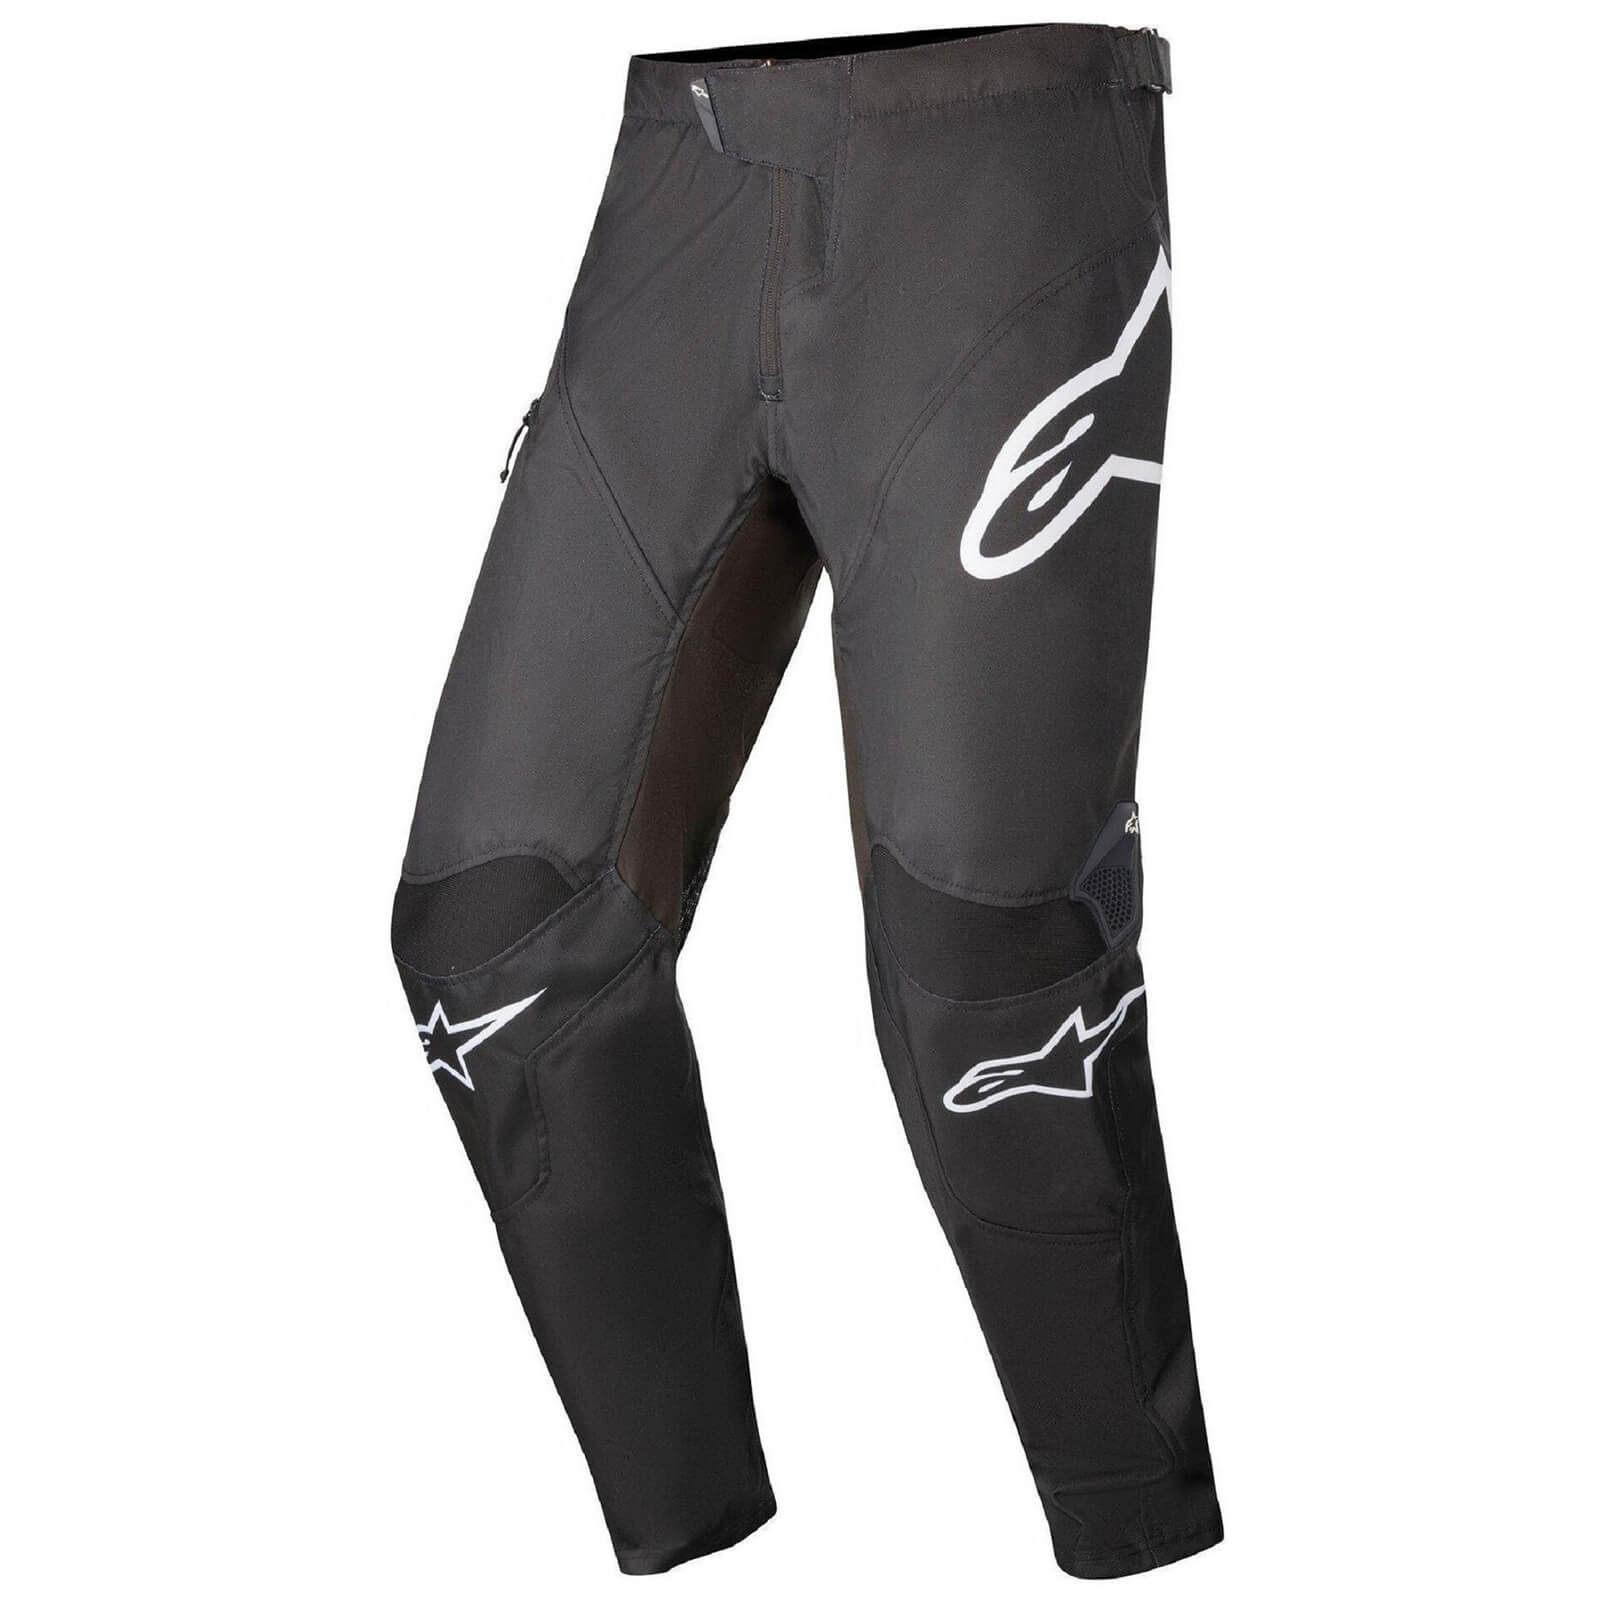 Alpinestars Racer MTB Pants - 36 - Black/White